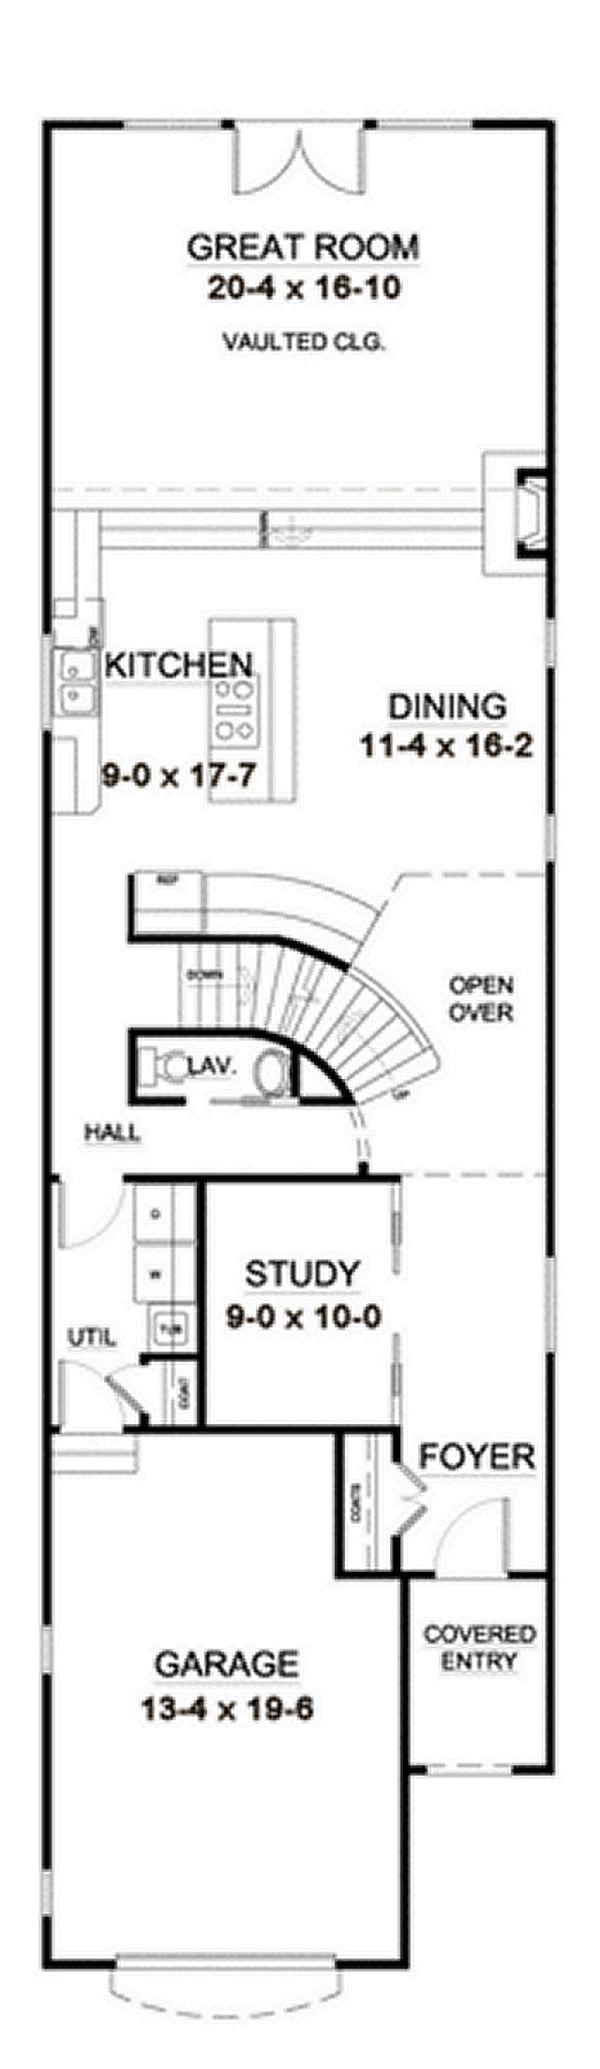 Home Plan - European Floor Plan - Main Floor Plan #126-227